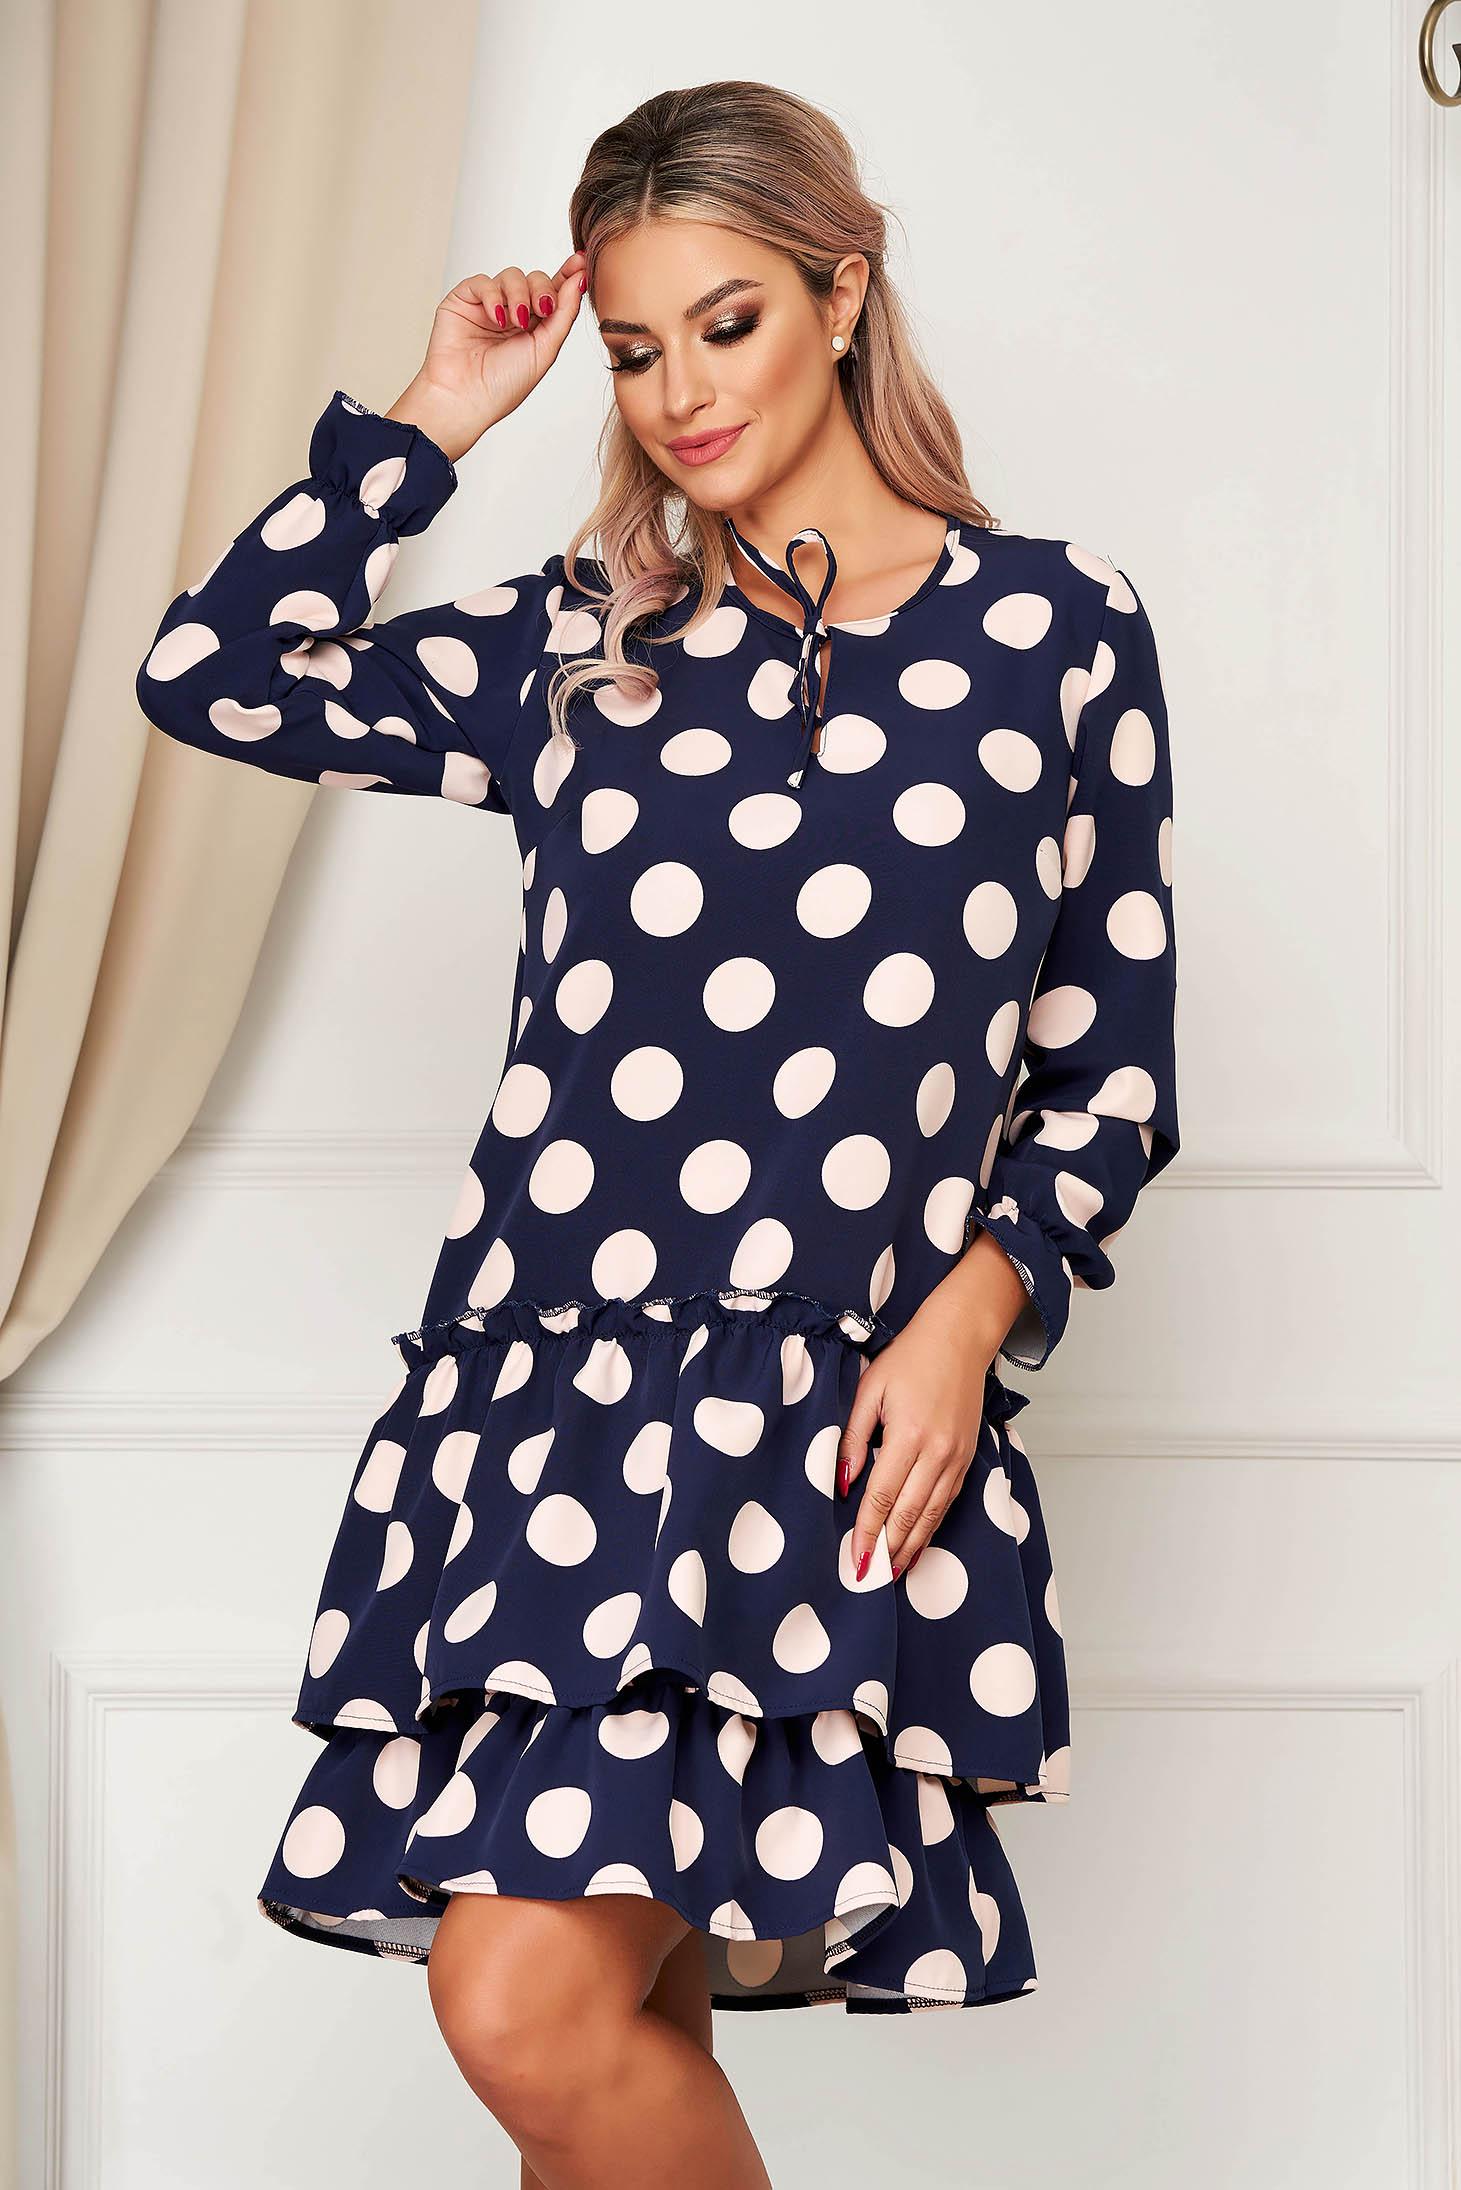 Rochie StarShinerS albastru-inchis de zi cu croi larg cu volanase la baza rochiei din material usor elastic cu buline